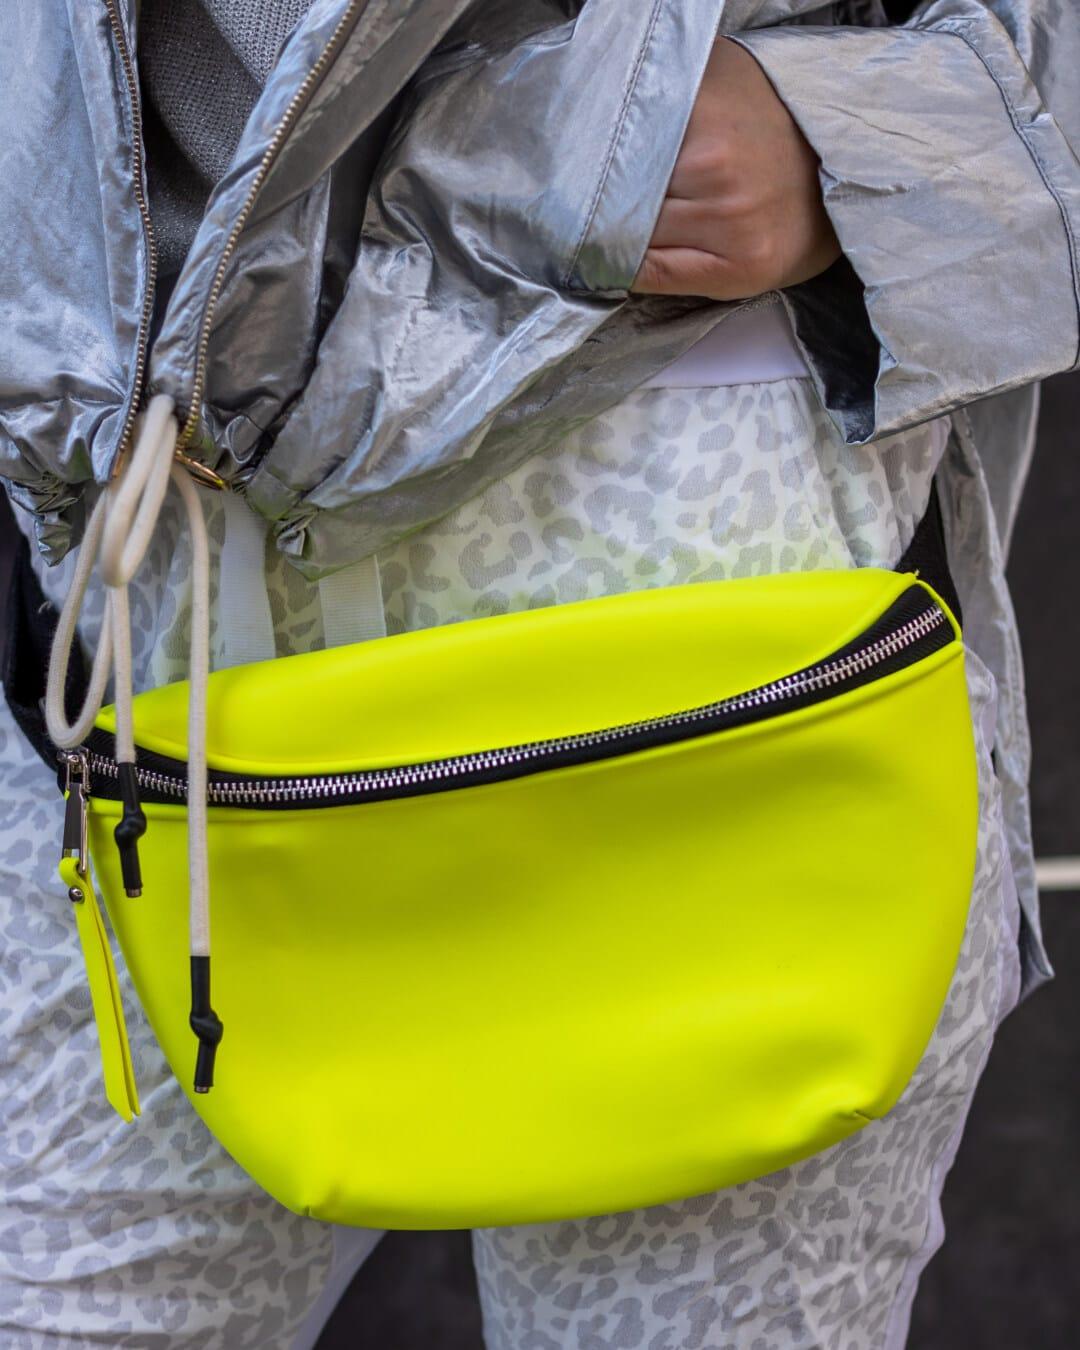 handbag, fancy, modern, yellow green, styling, outfit, jacket, grey, woman, plastic